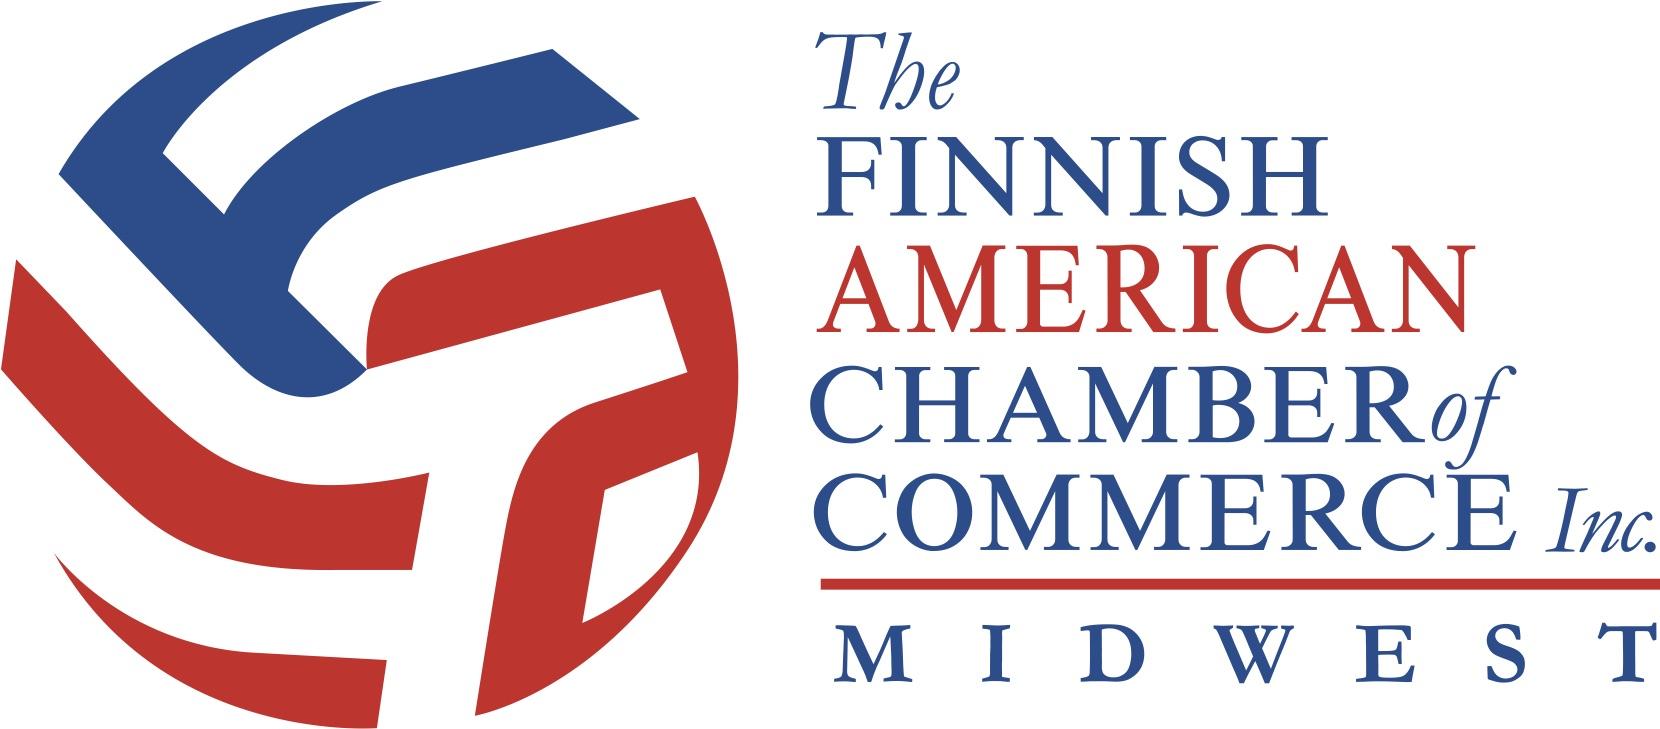 finnish american logo.jpg